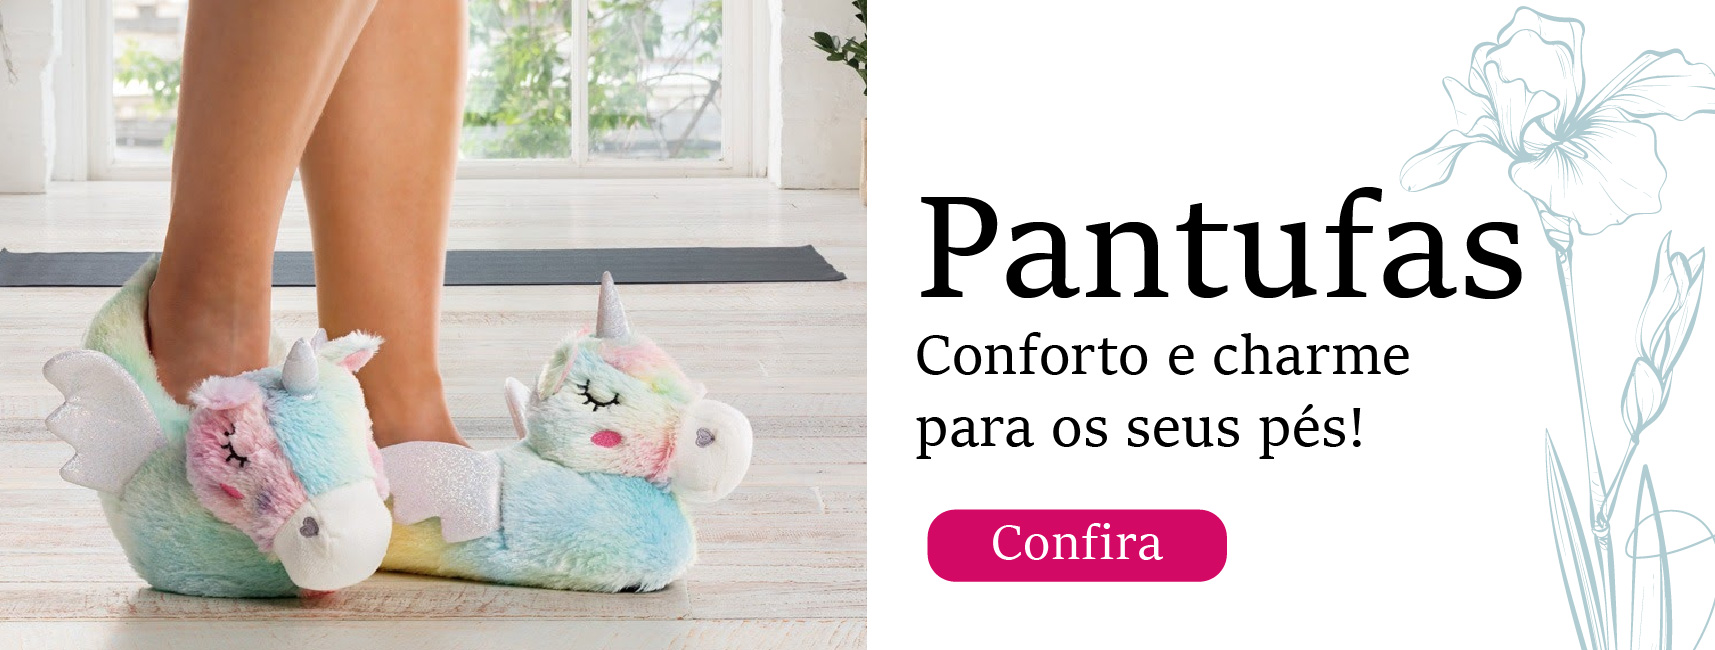 Pantufa-mobile